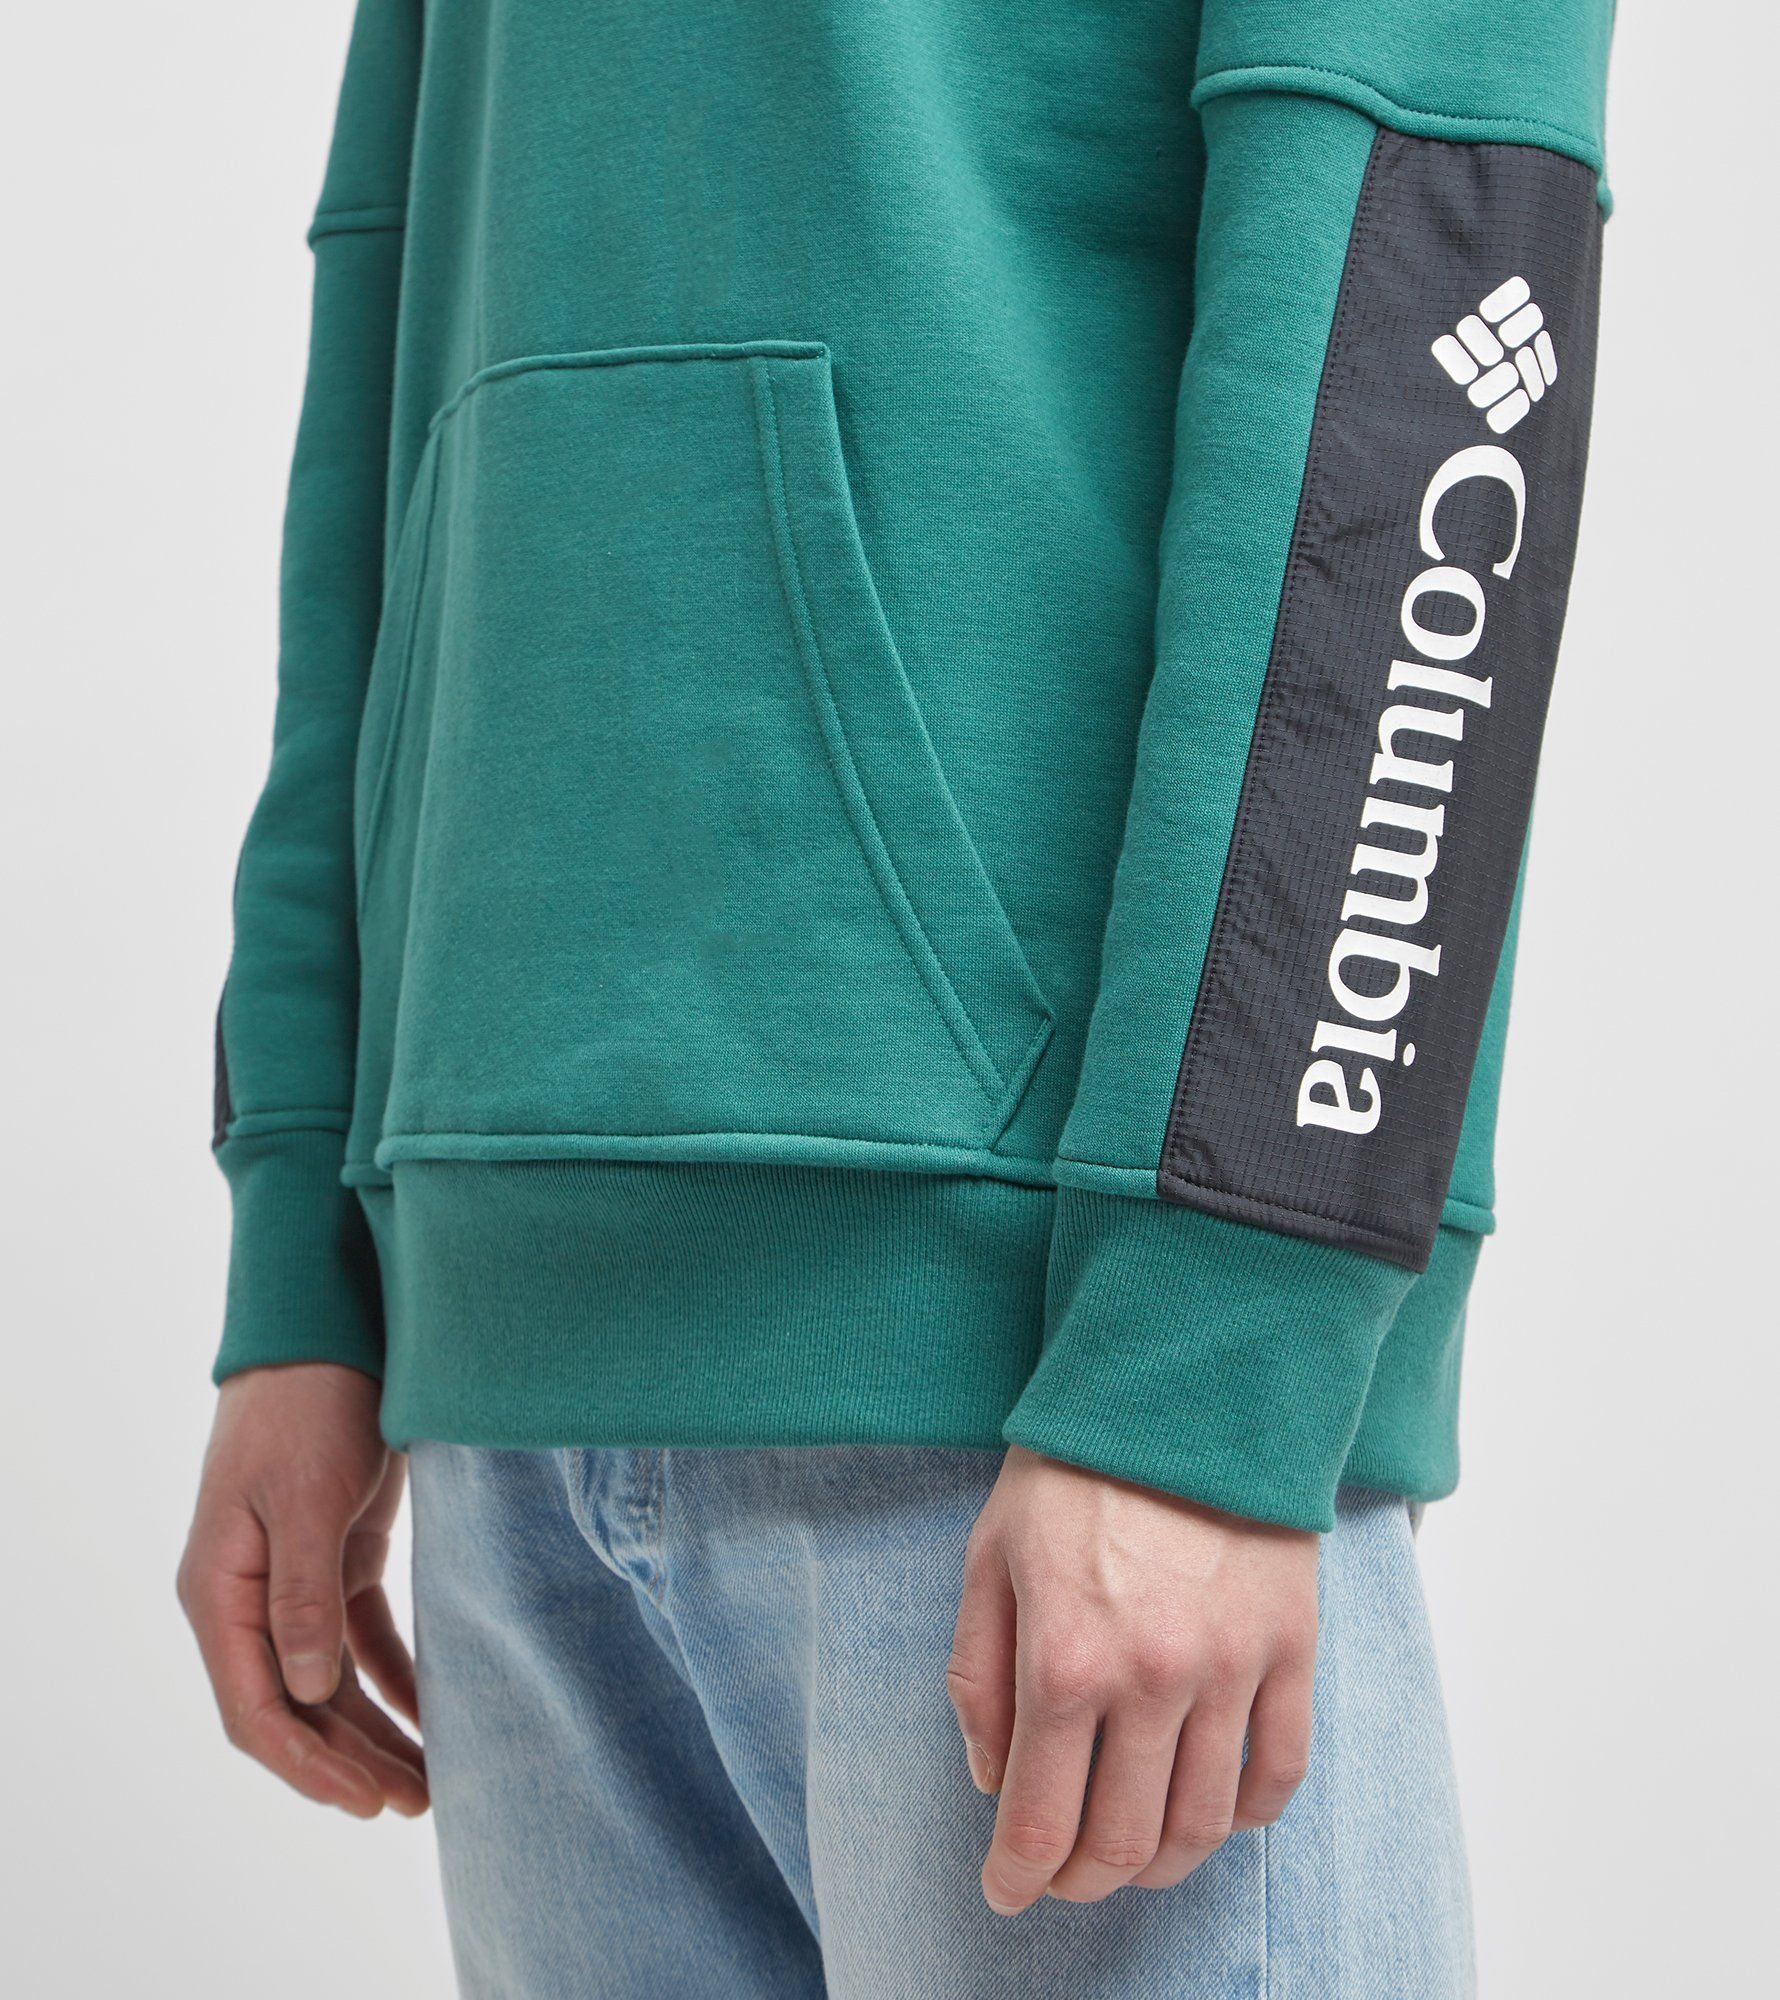 Columbia Freemont Overhead Hoodie - size? Exclusive